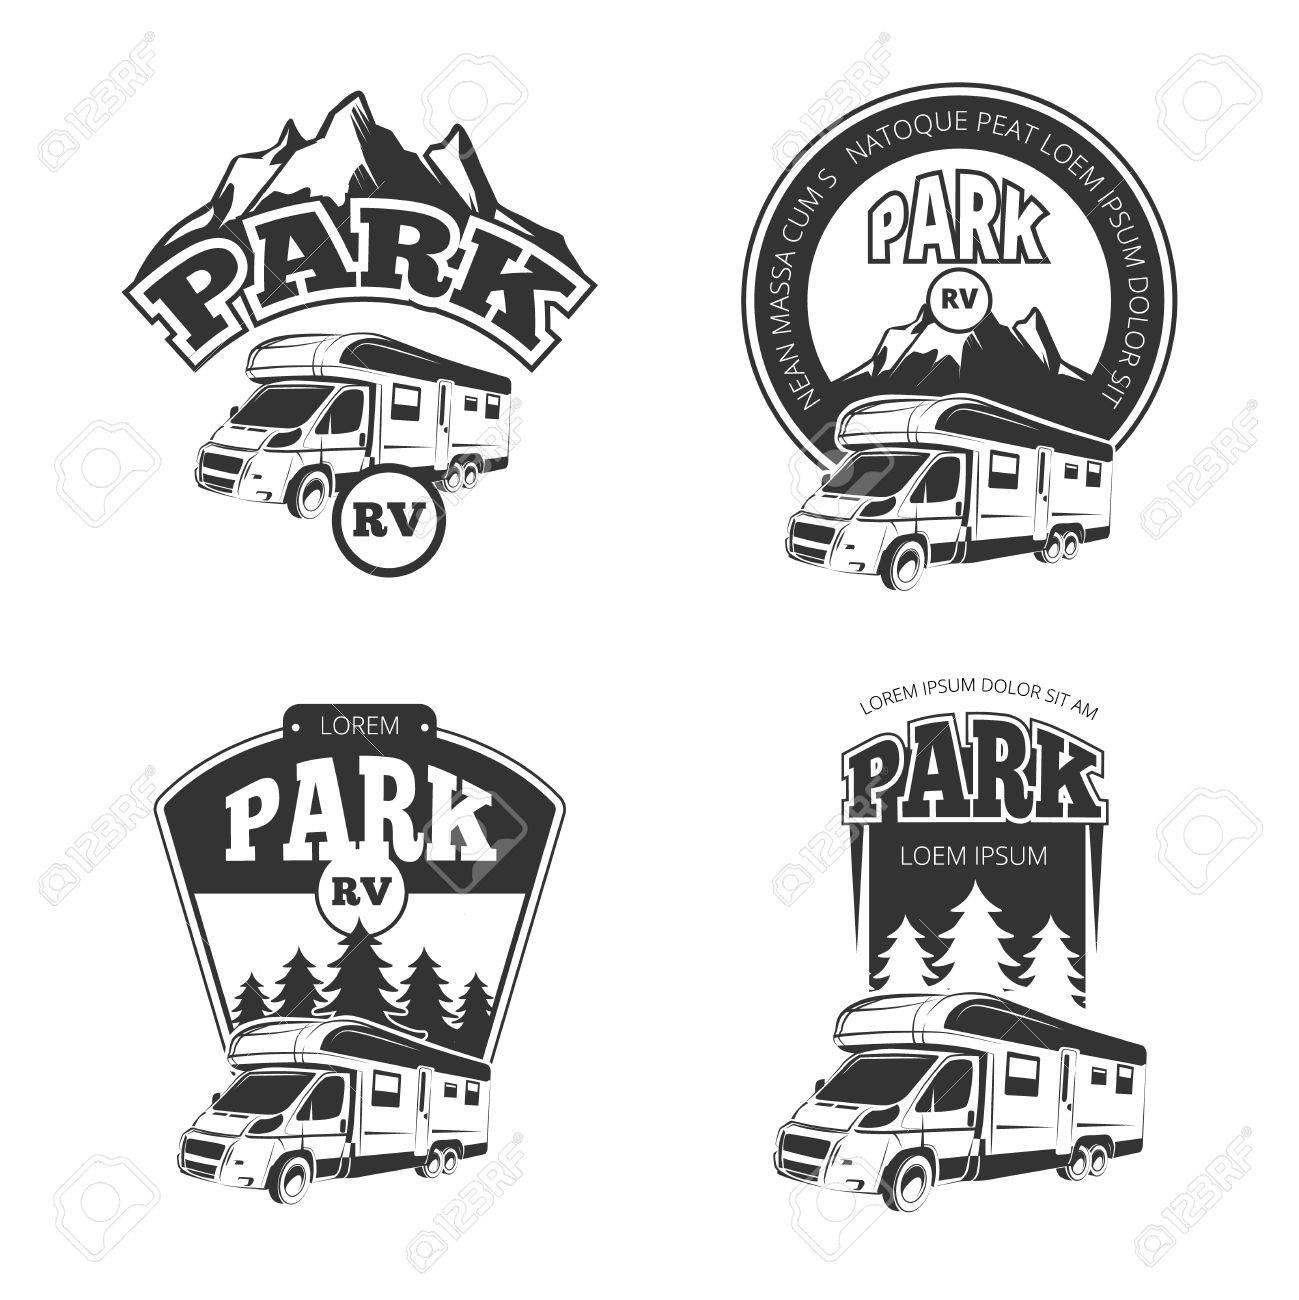 Clipart black and white trailer park image transparent download Camper clipart trailer park - 122 transparent clip arts, images and ... image transparent download